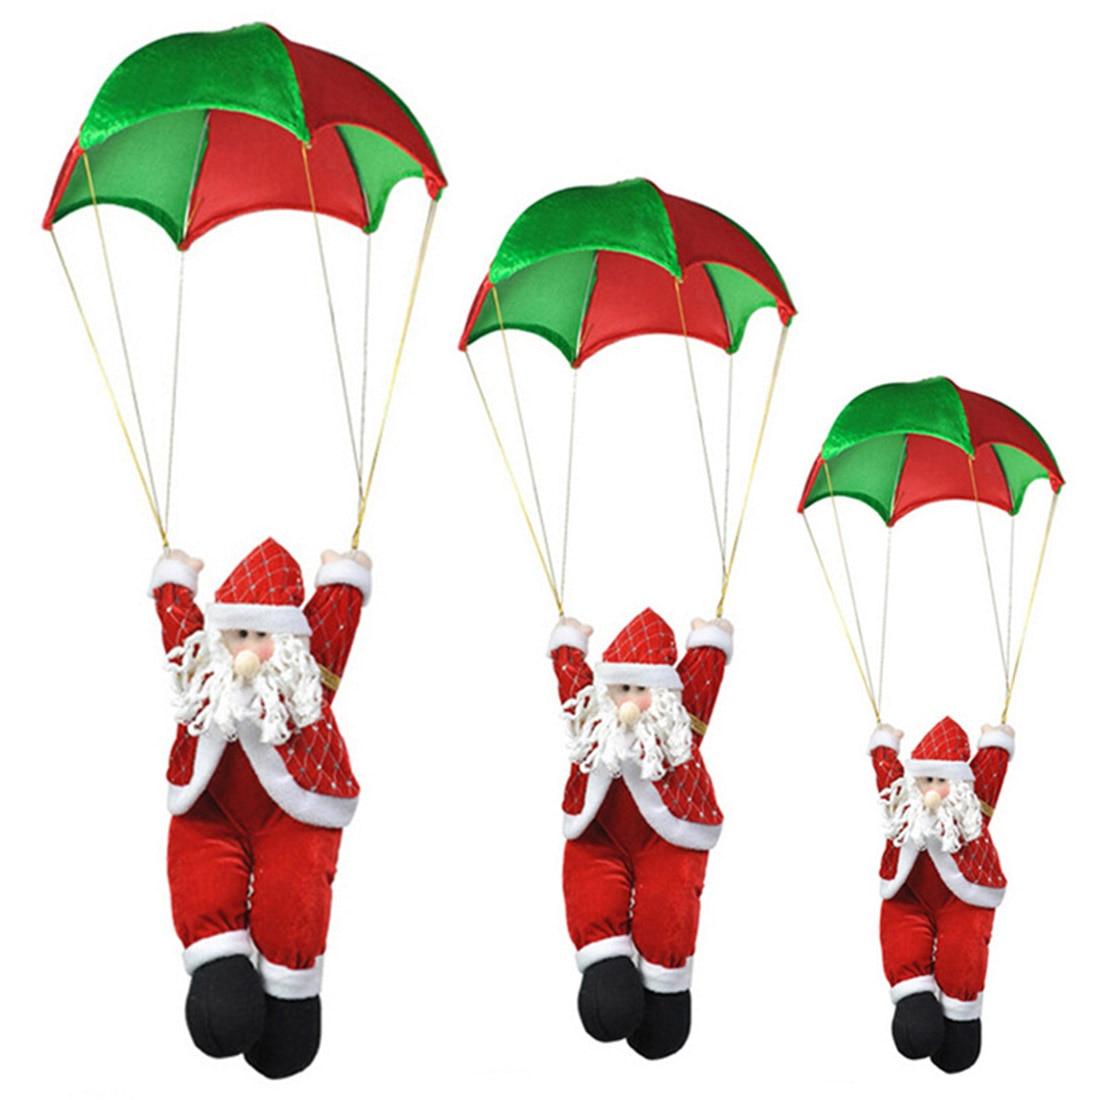 Christmas Pendants Home Window Ceiling Decor Parachute Santa Claus Xmas New Year Hanging Pendant Christmas Decorations Supplies